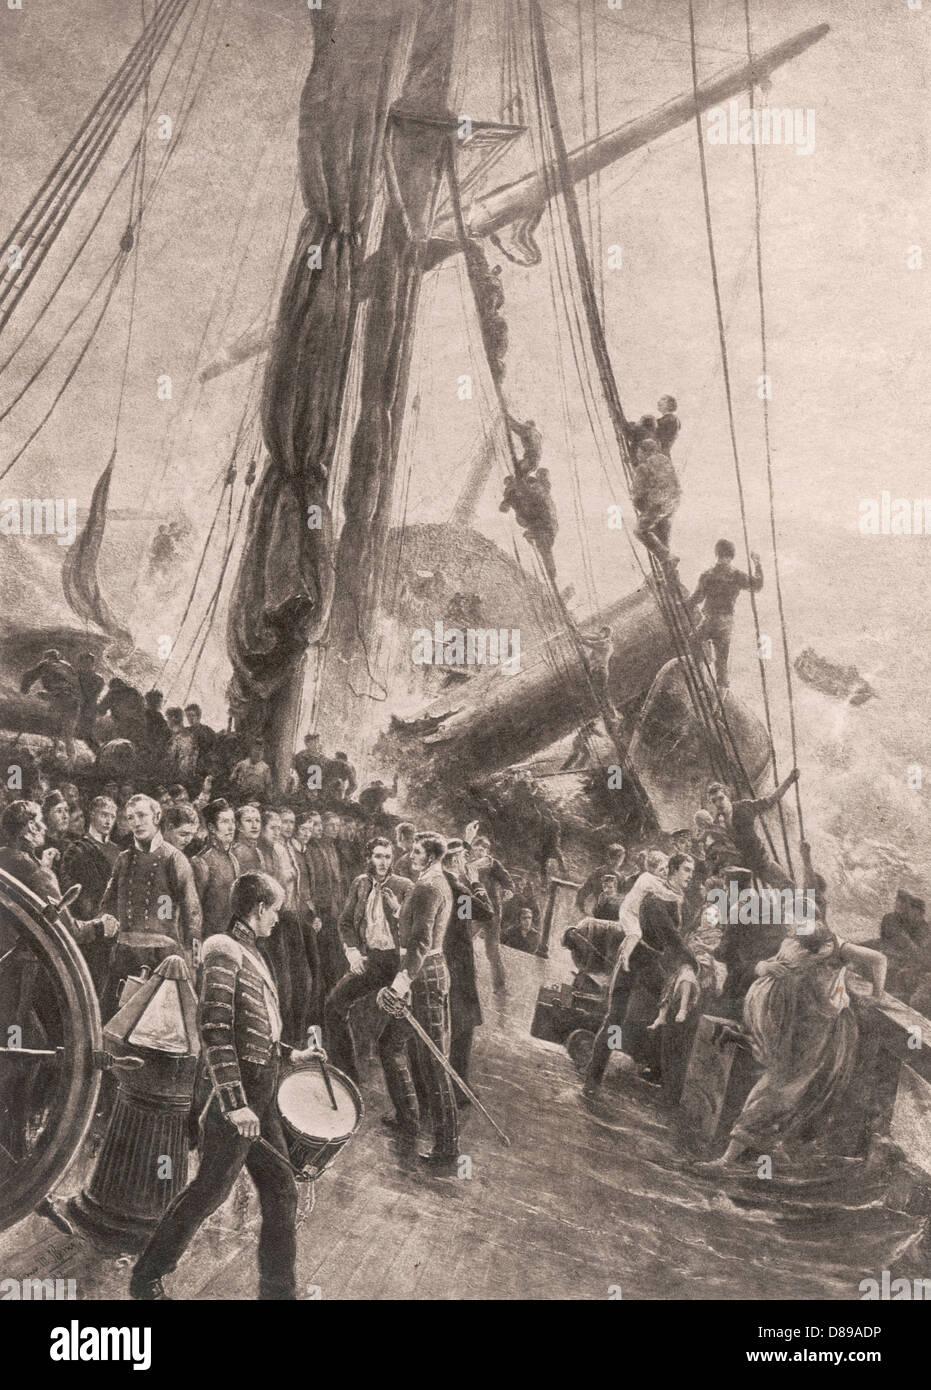 Birkenhead Wrecked B+w Photo Stock